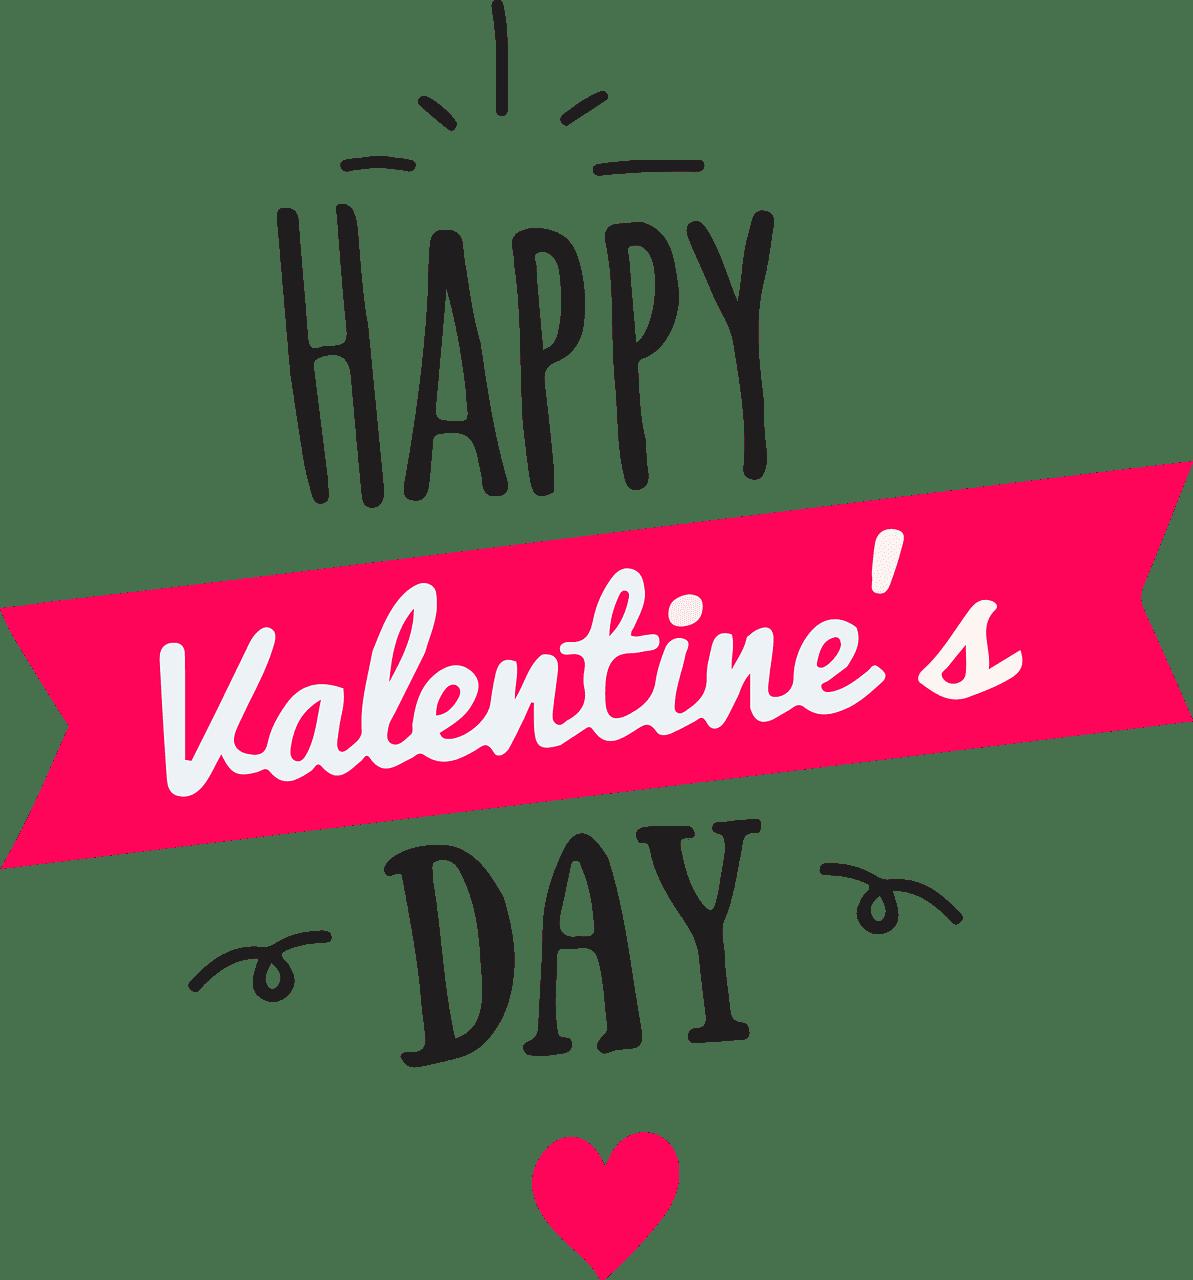 14th February - Saint Valentine's Day